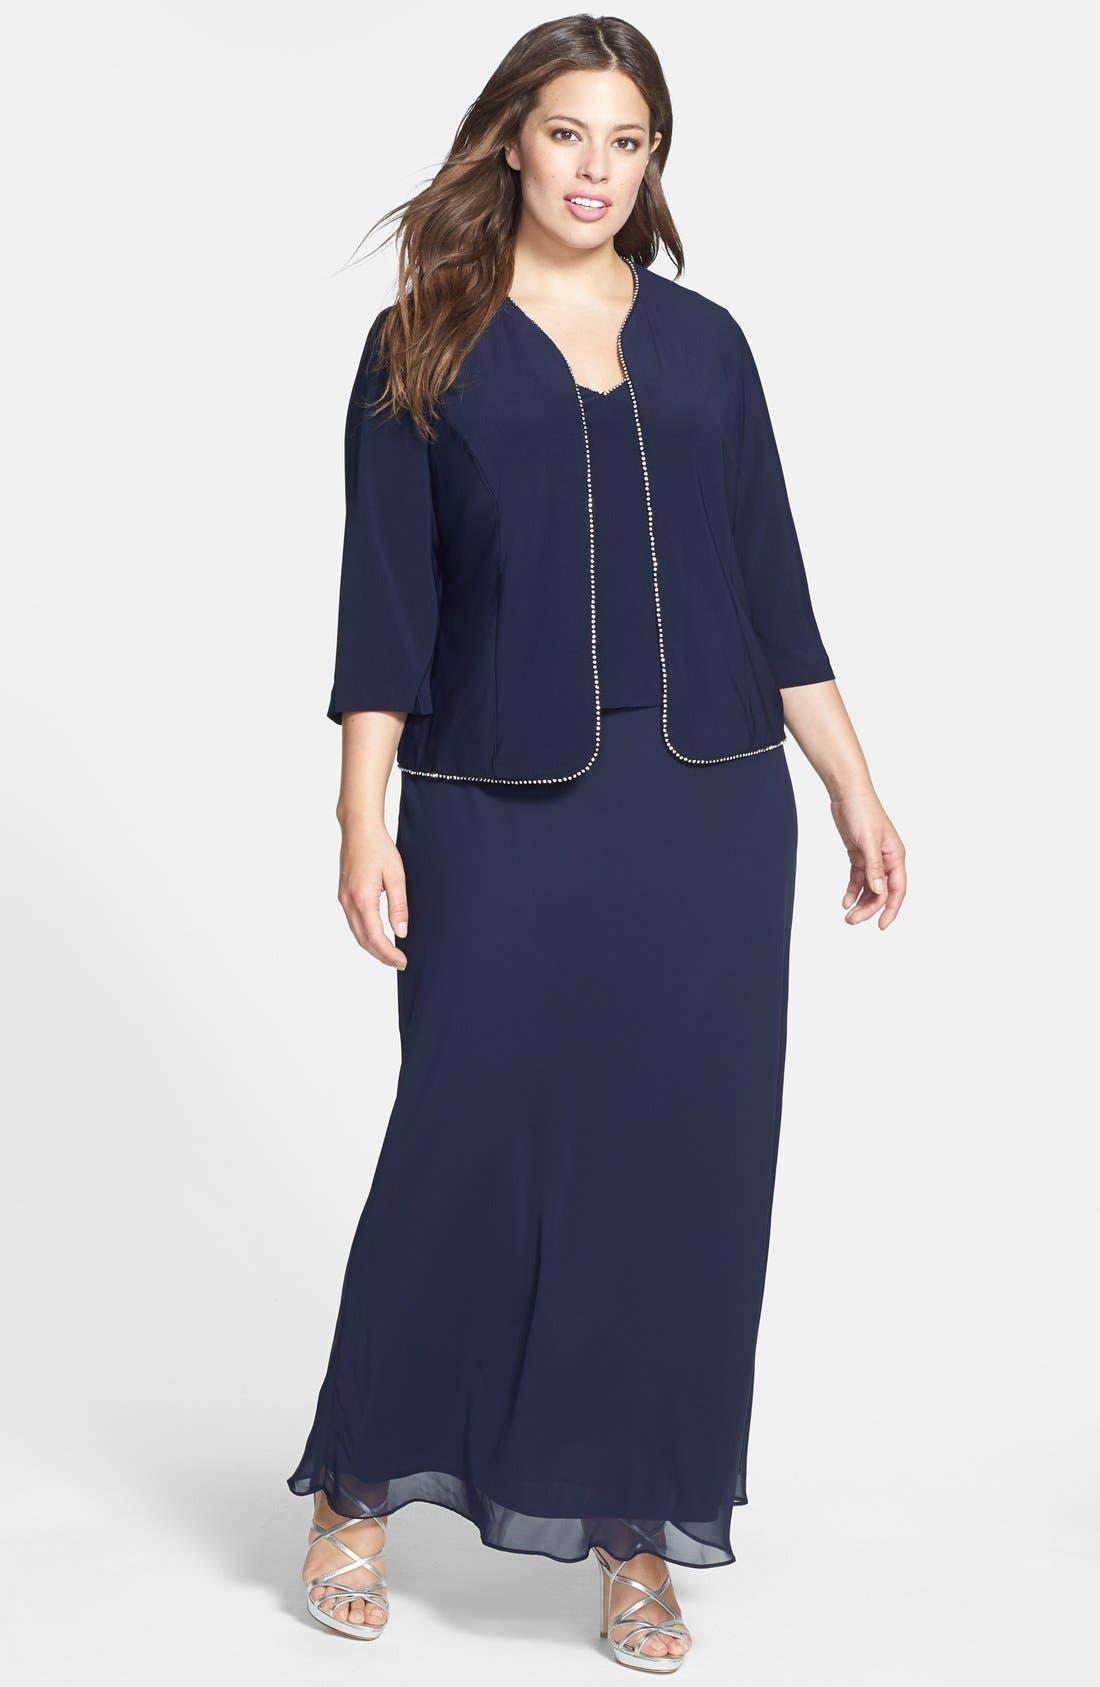 Alternate Image 1 Selected - Alex Evenings Rhinestone Trim Gown & Jacket (Plus Size)